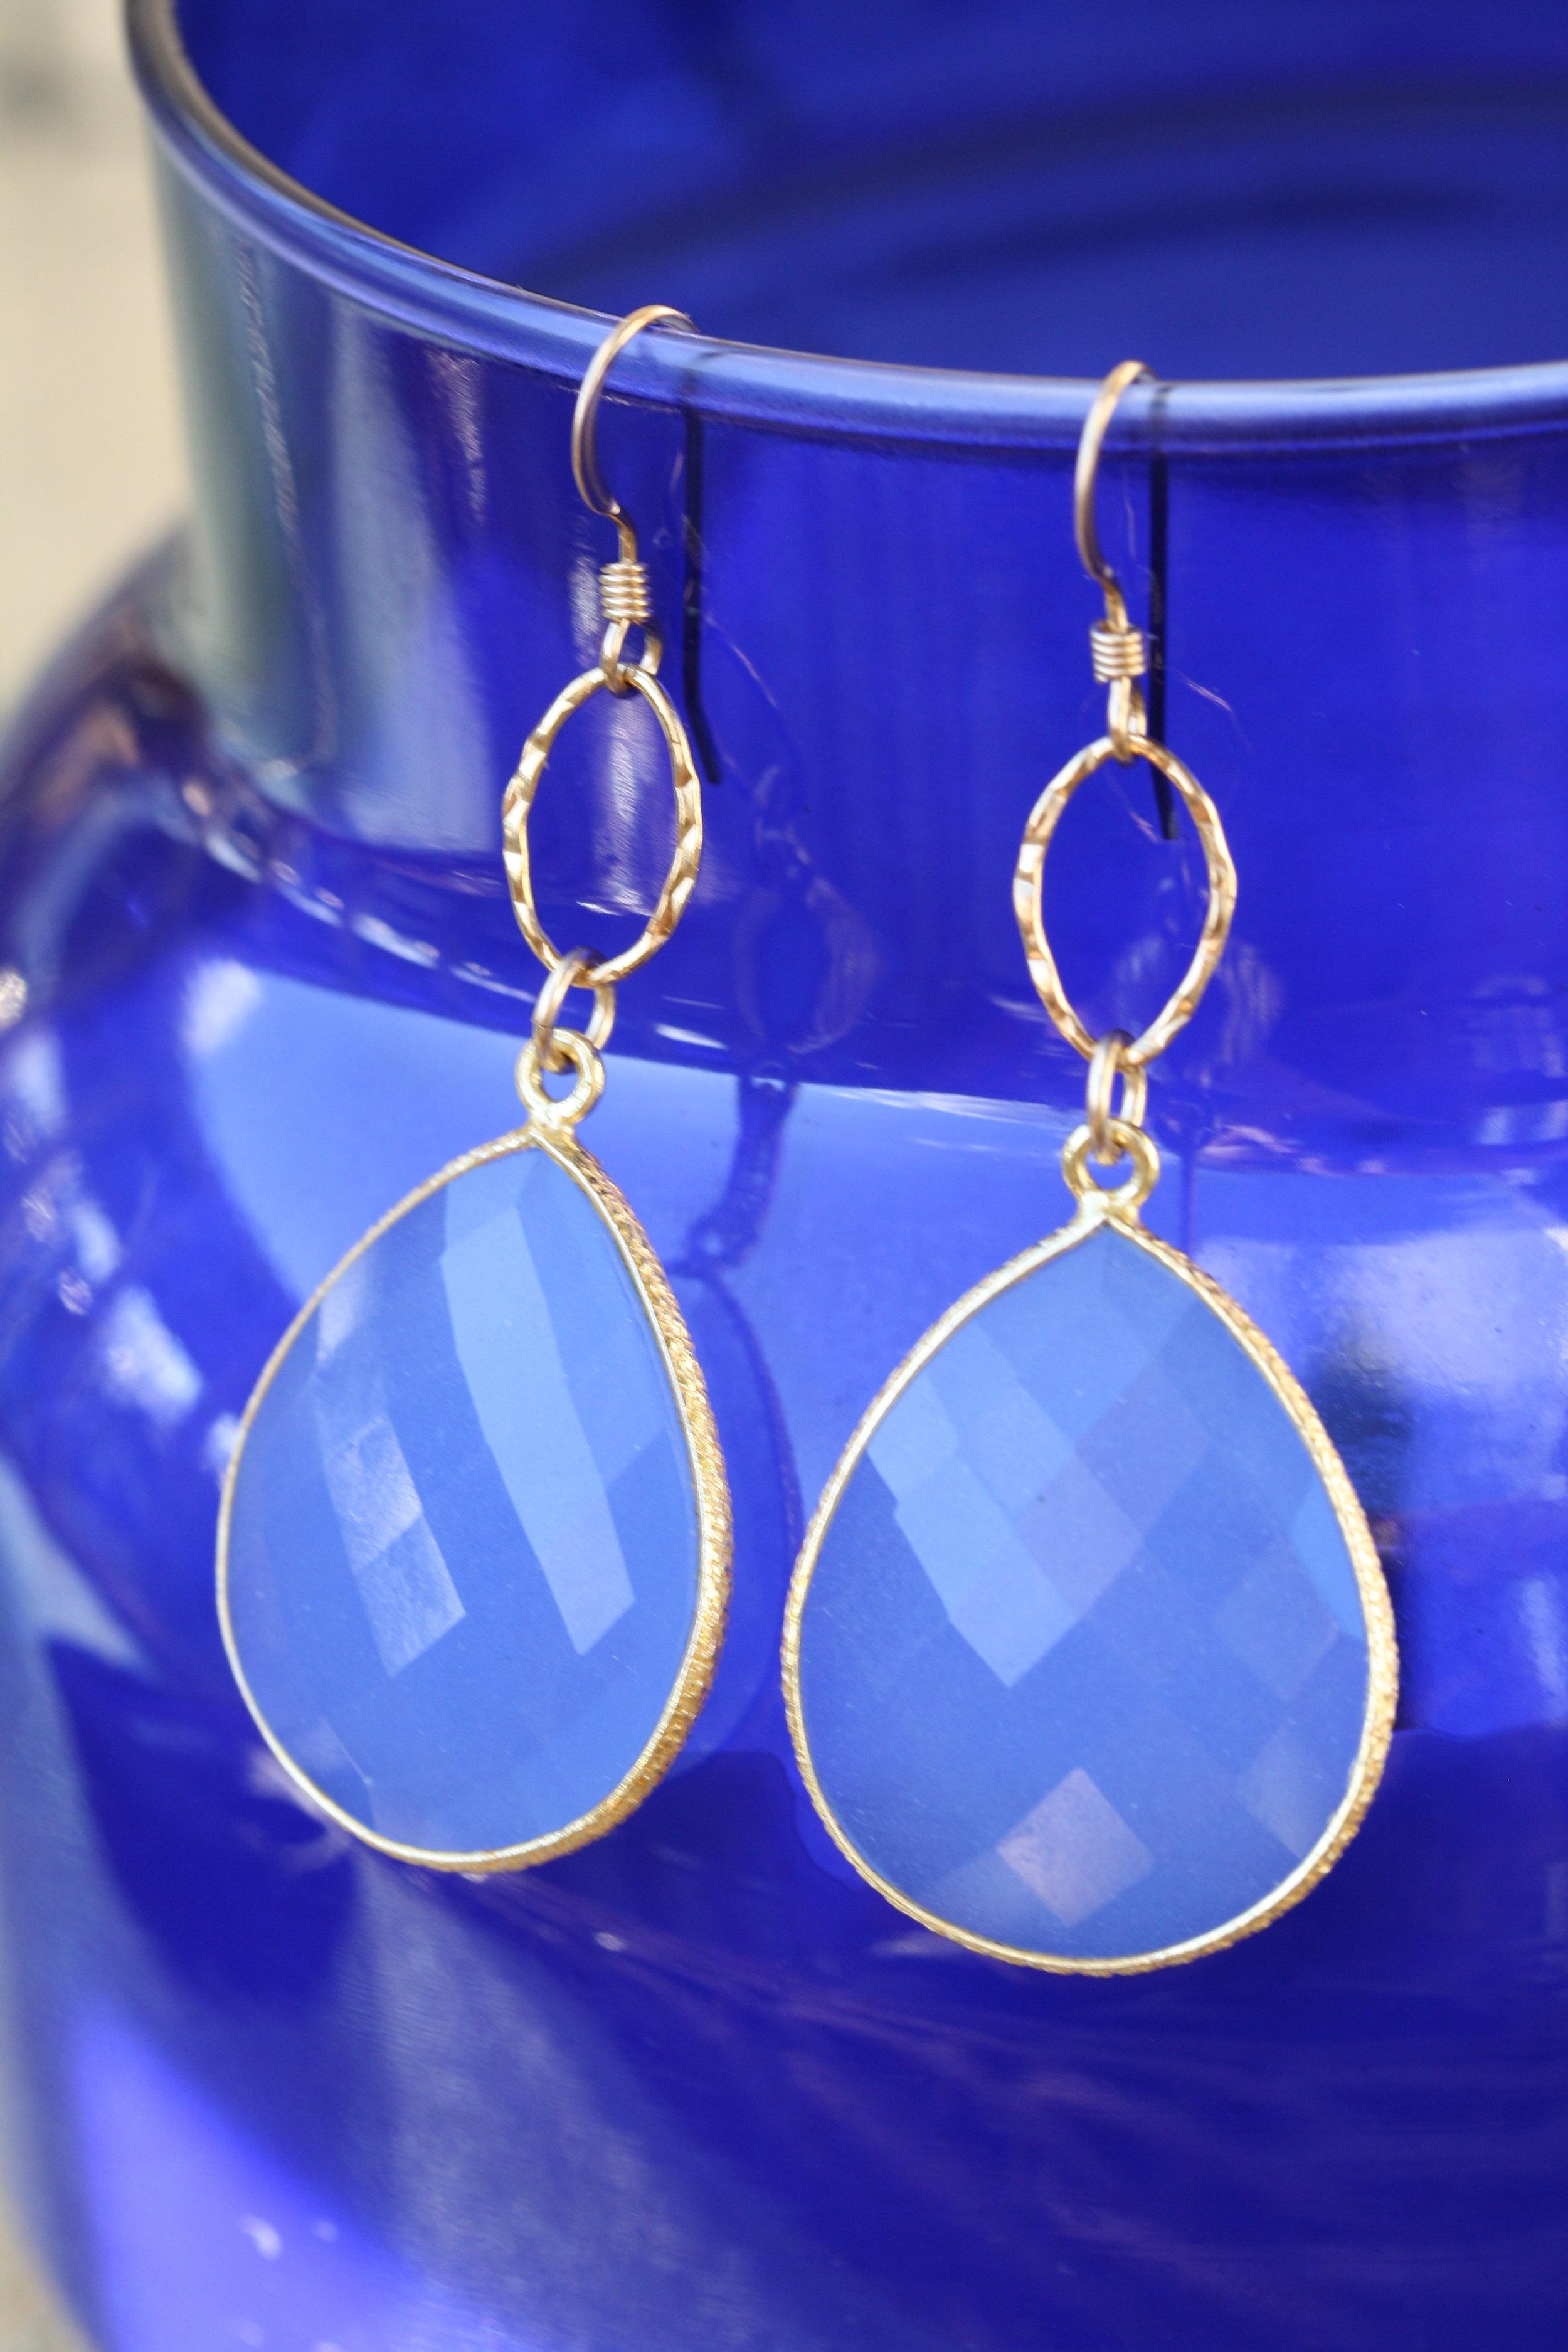 Blue Chalcedony Pear Drops on Hammered Hoop Earrings_02 copy.JPG